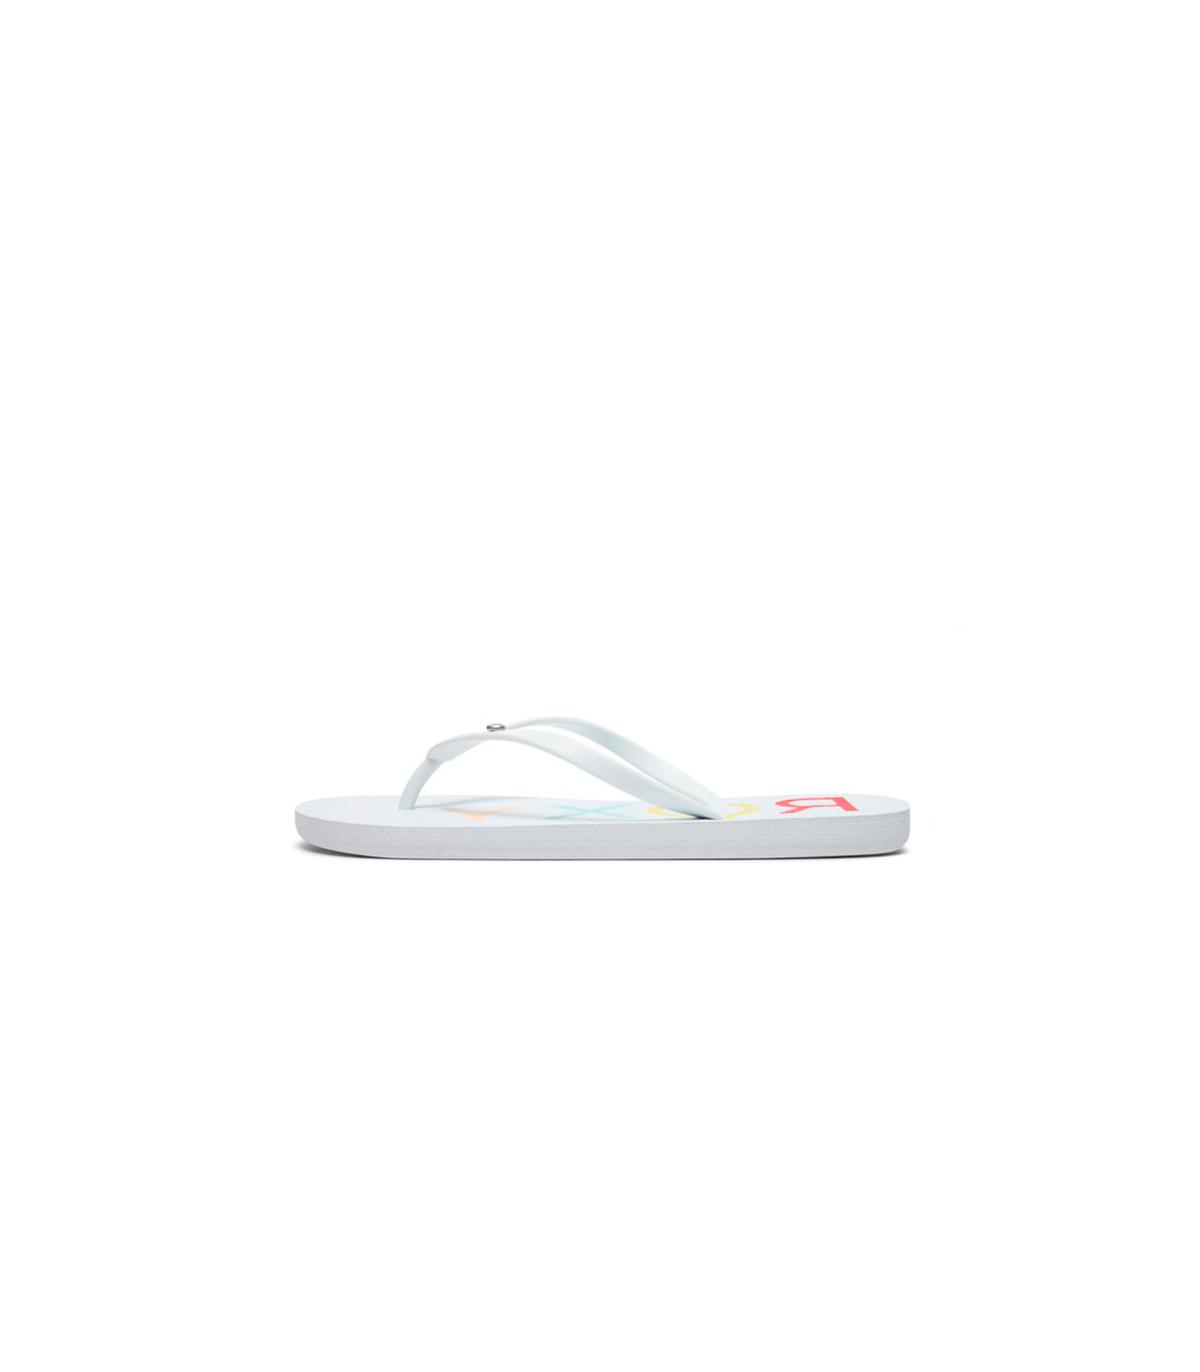 28f8f4da1f Buy Roxy Viva IV flip flop